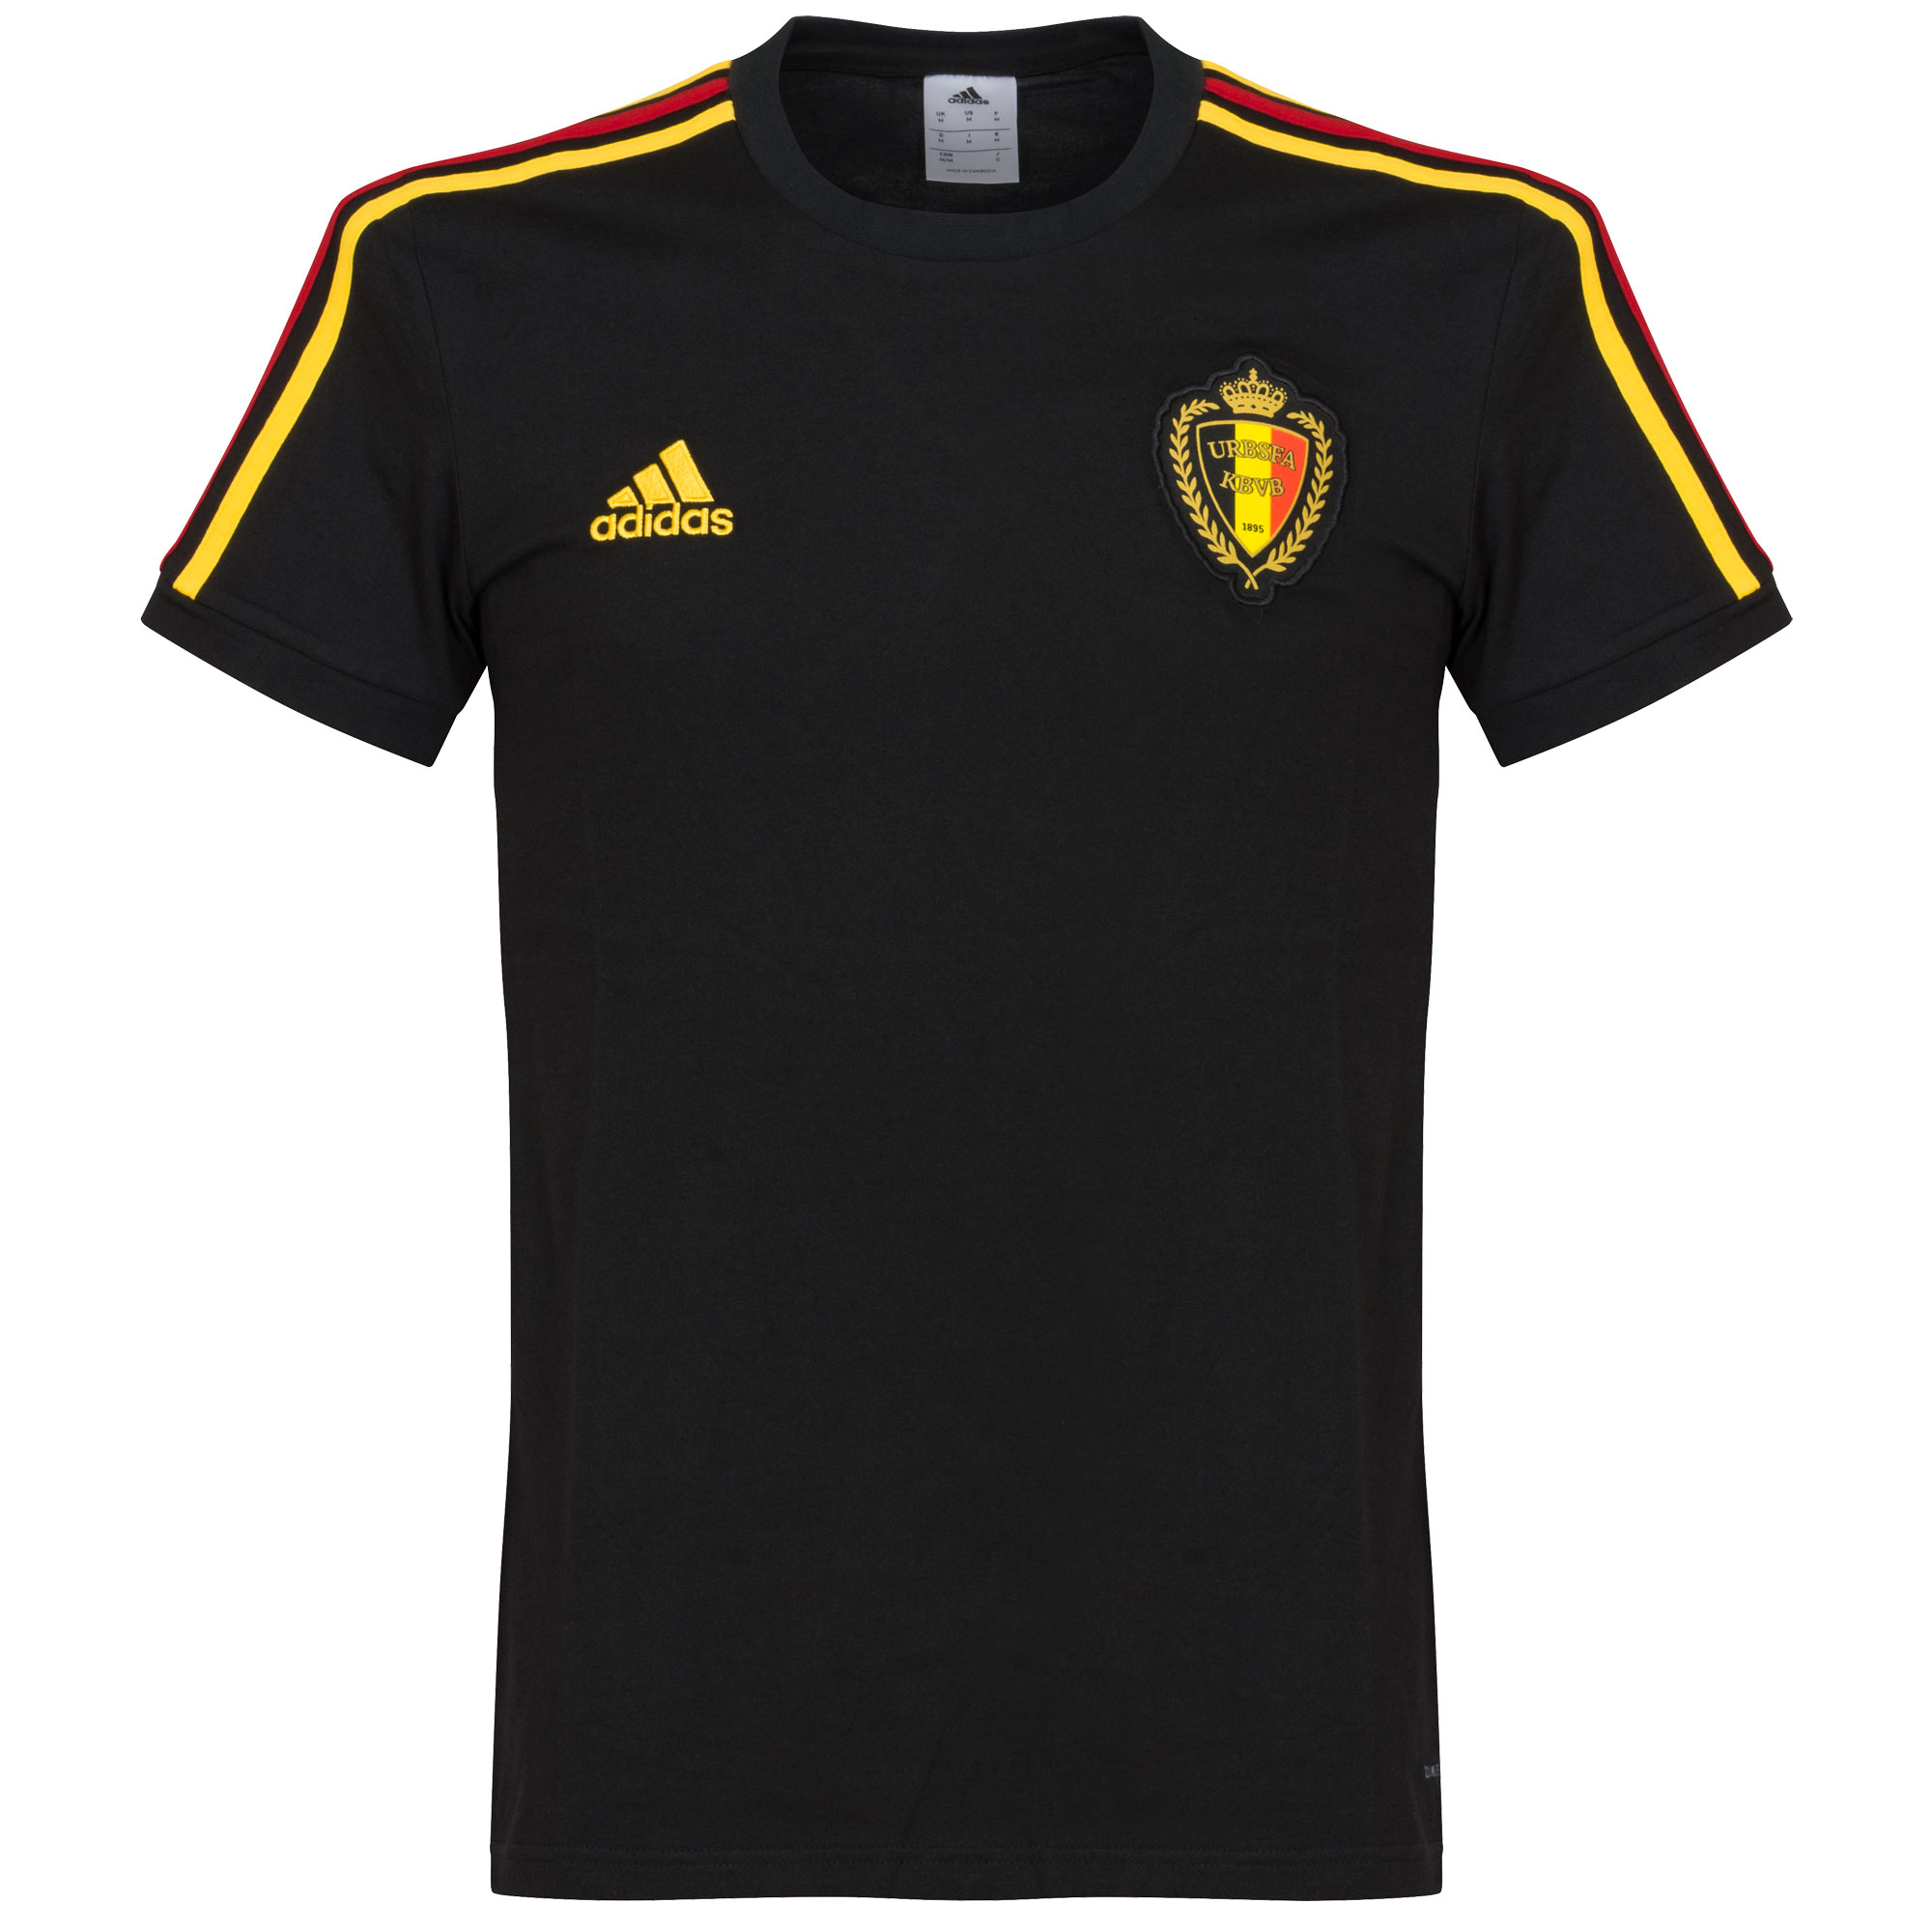 Belgium Tee 2018 / 2019 - Black - 50